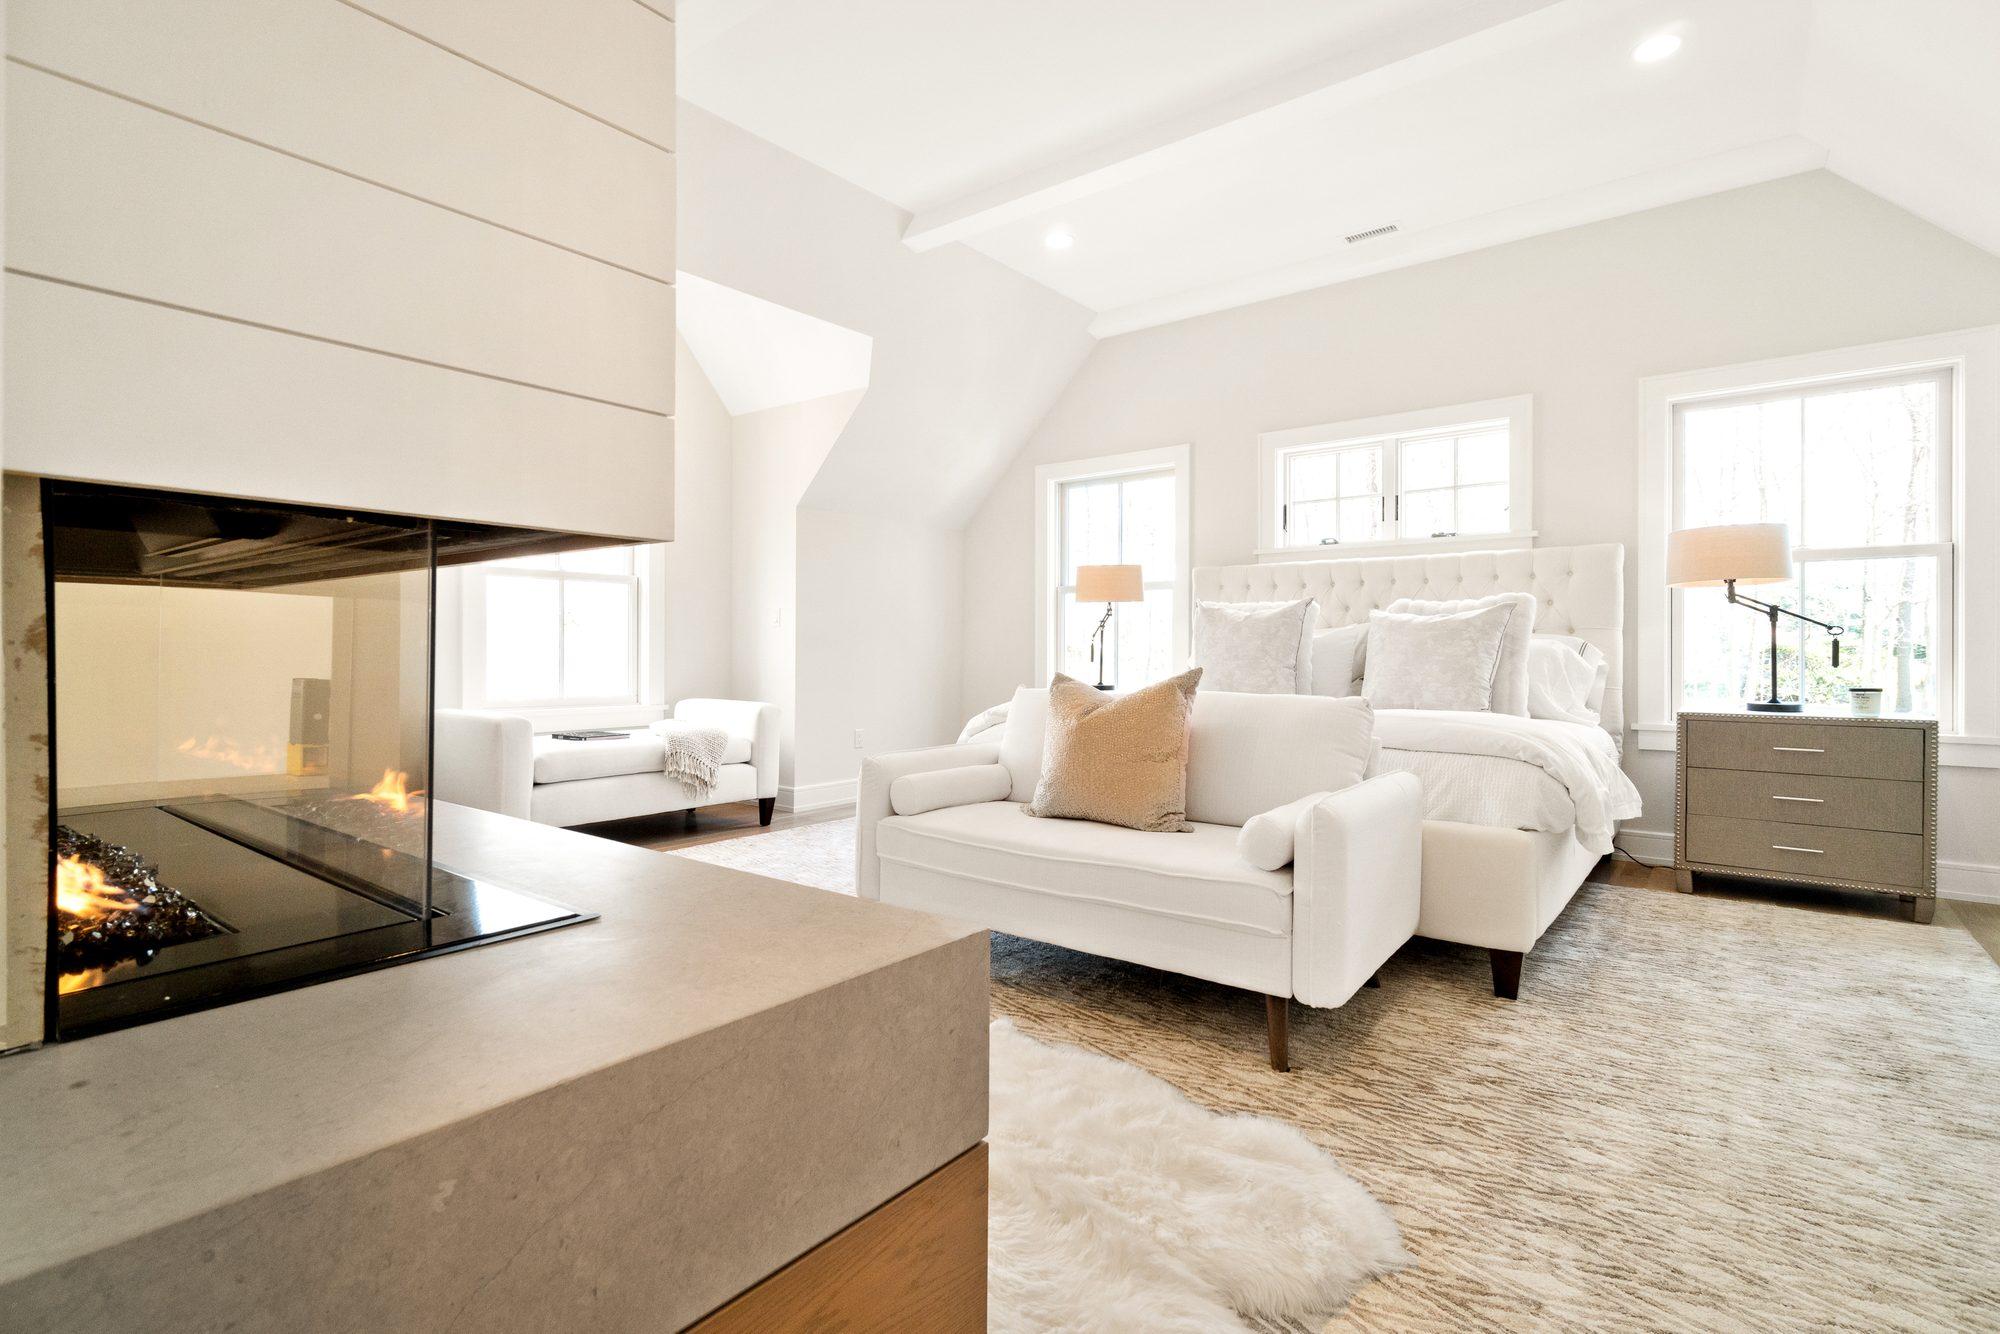 Master Bedroom Design Ideas  Bedroom Decorating & Style Tips